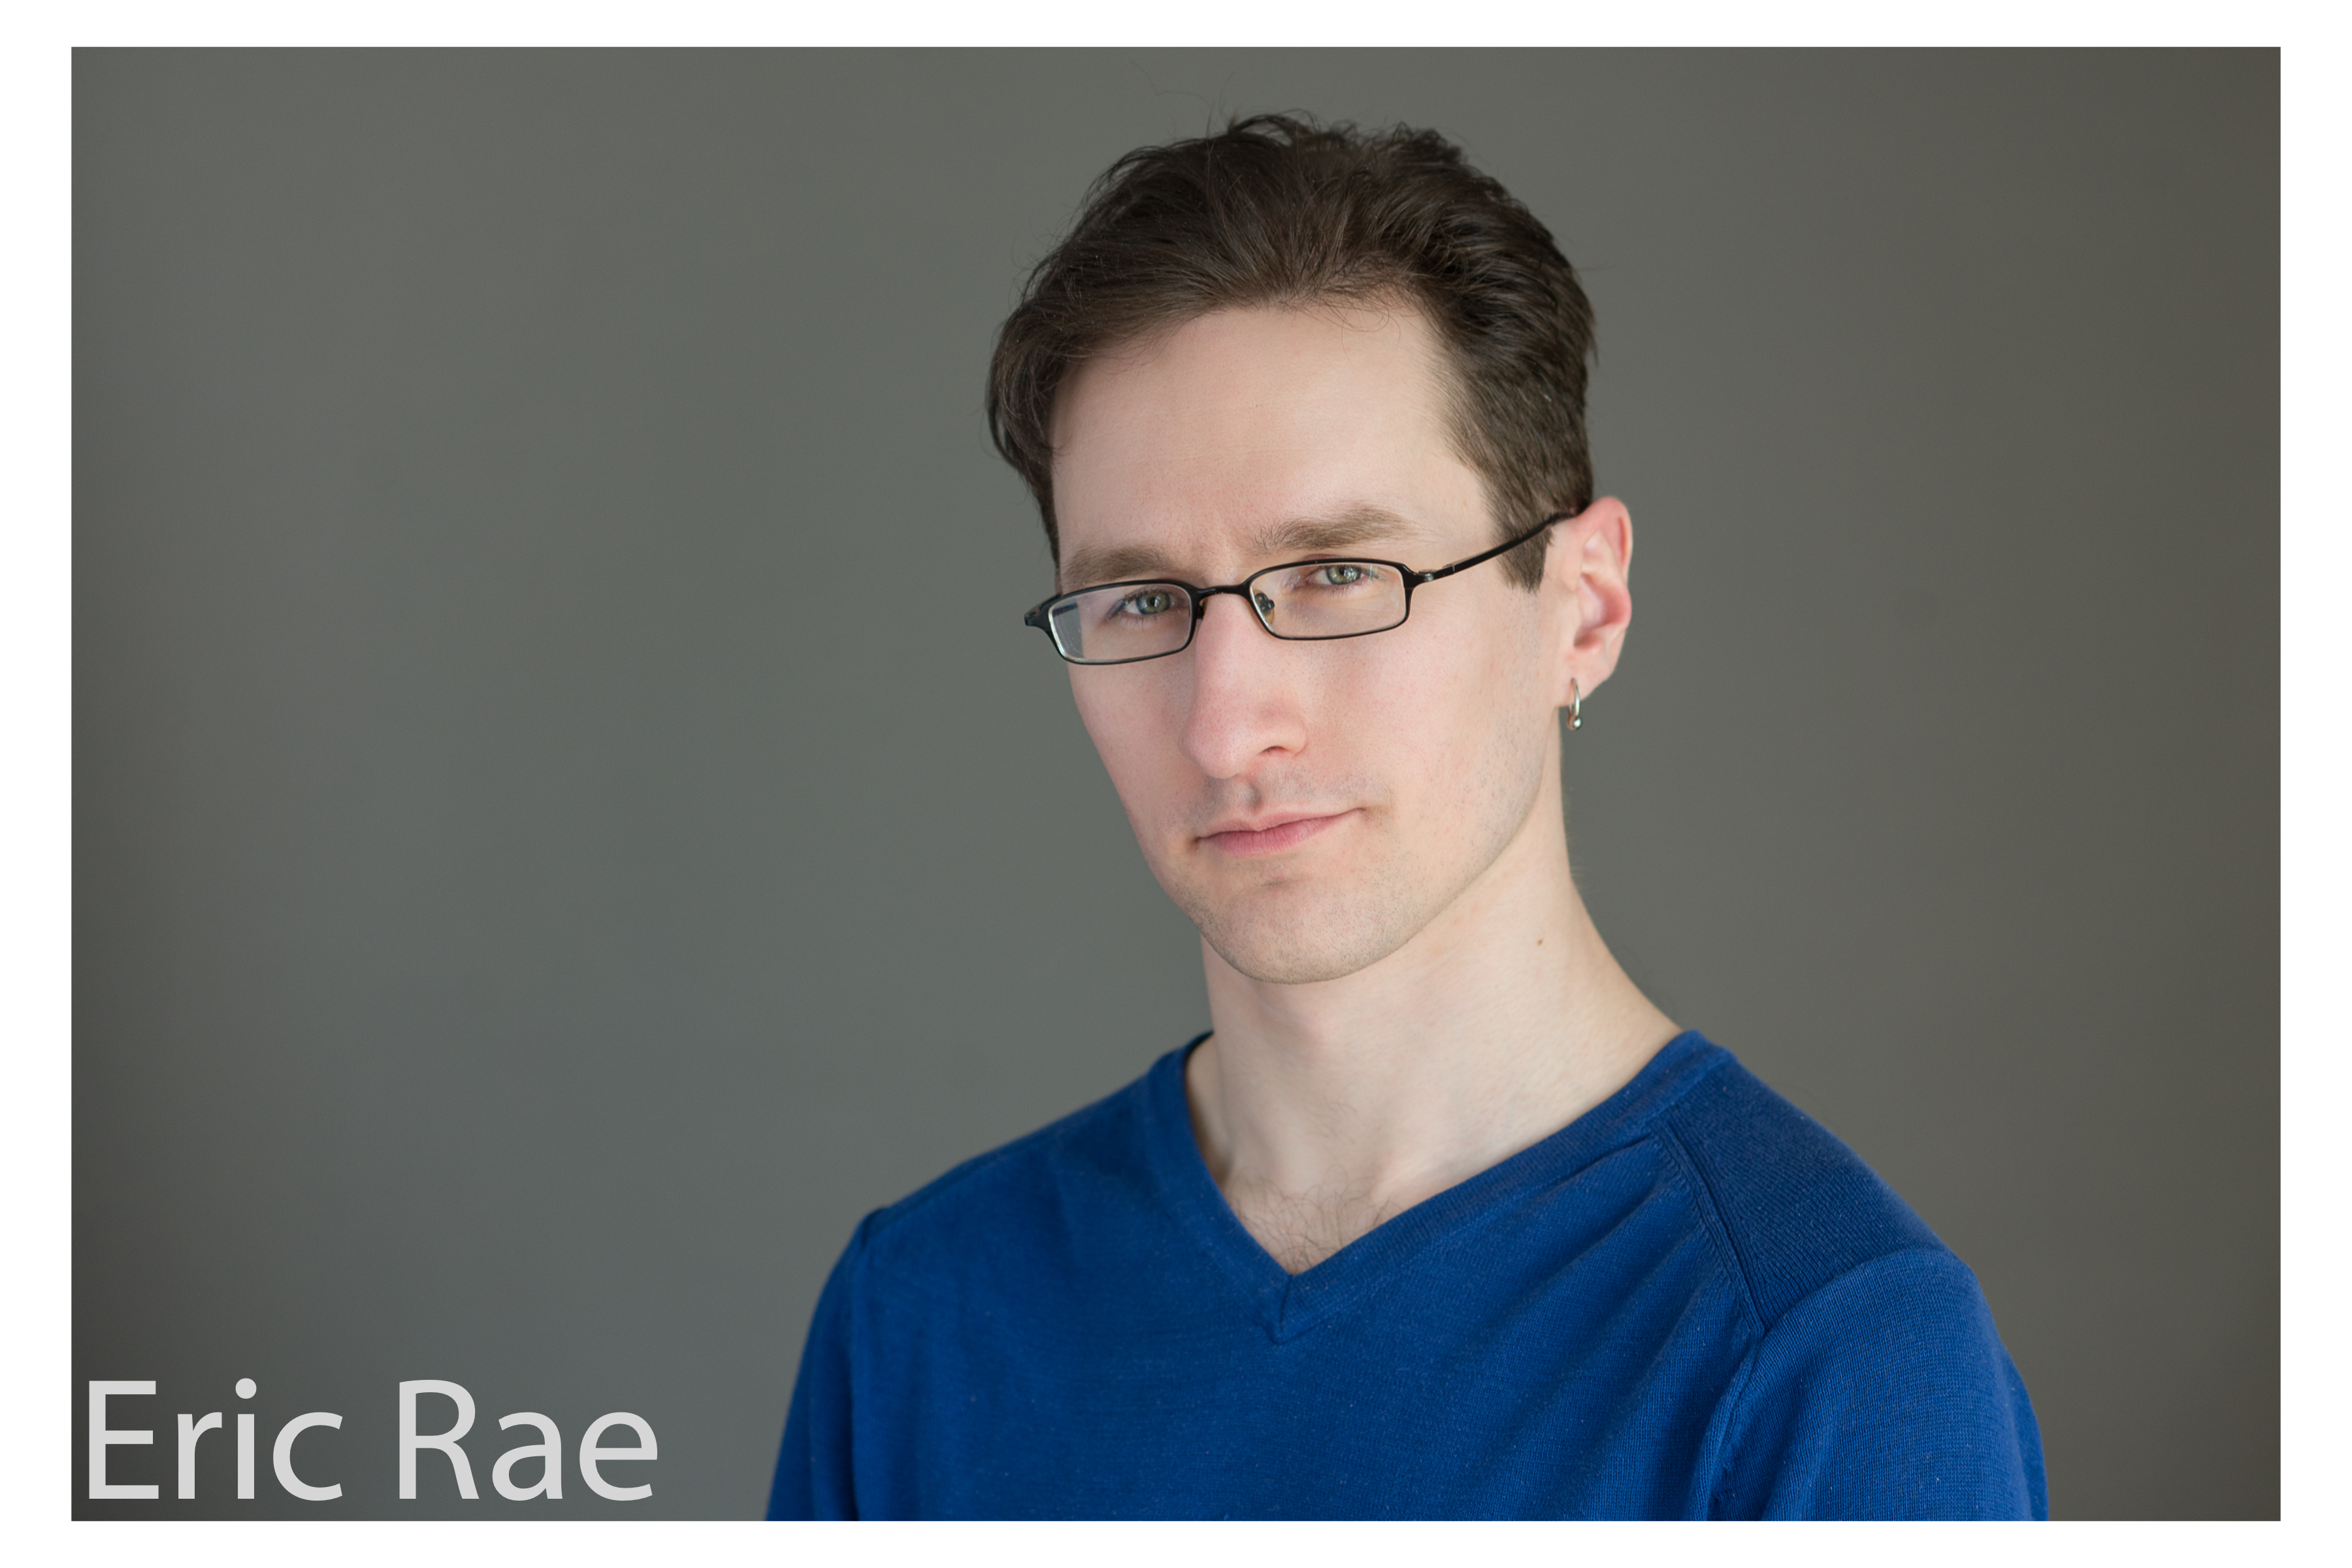 Eric Rae